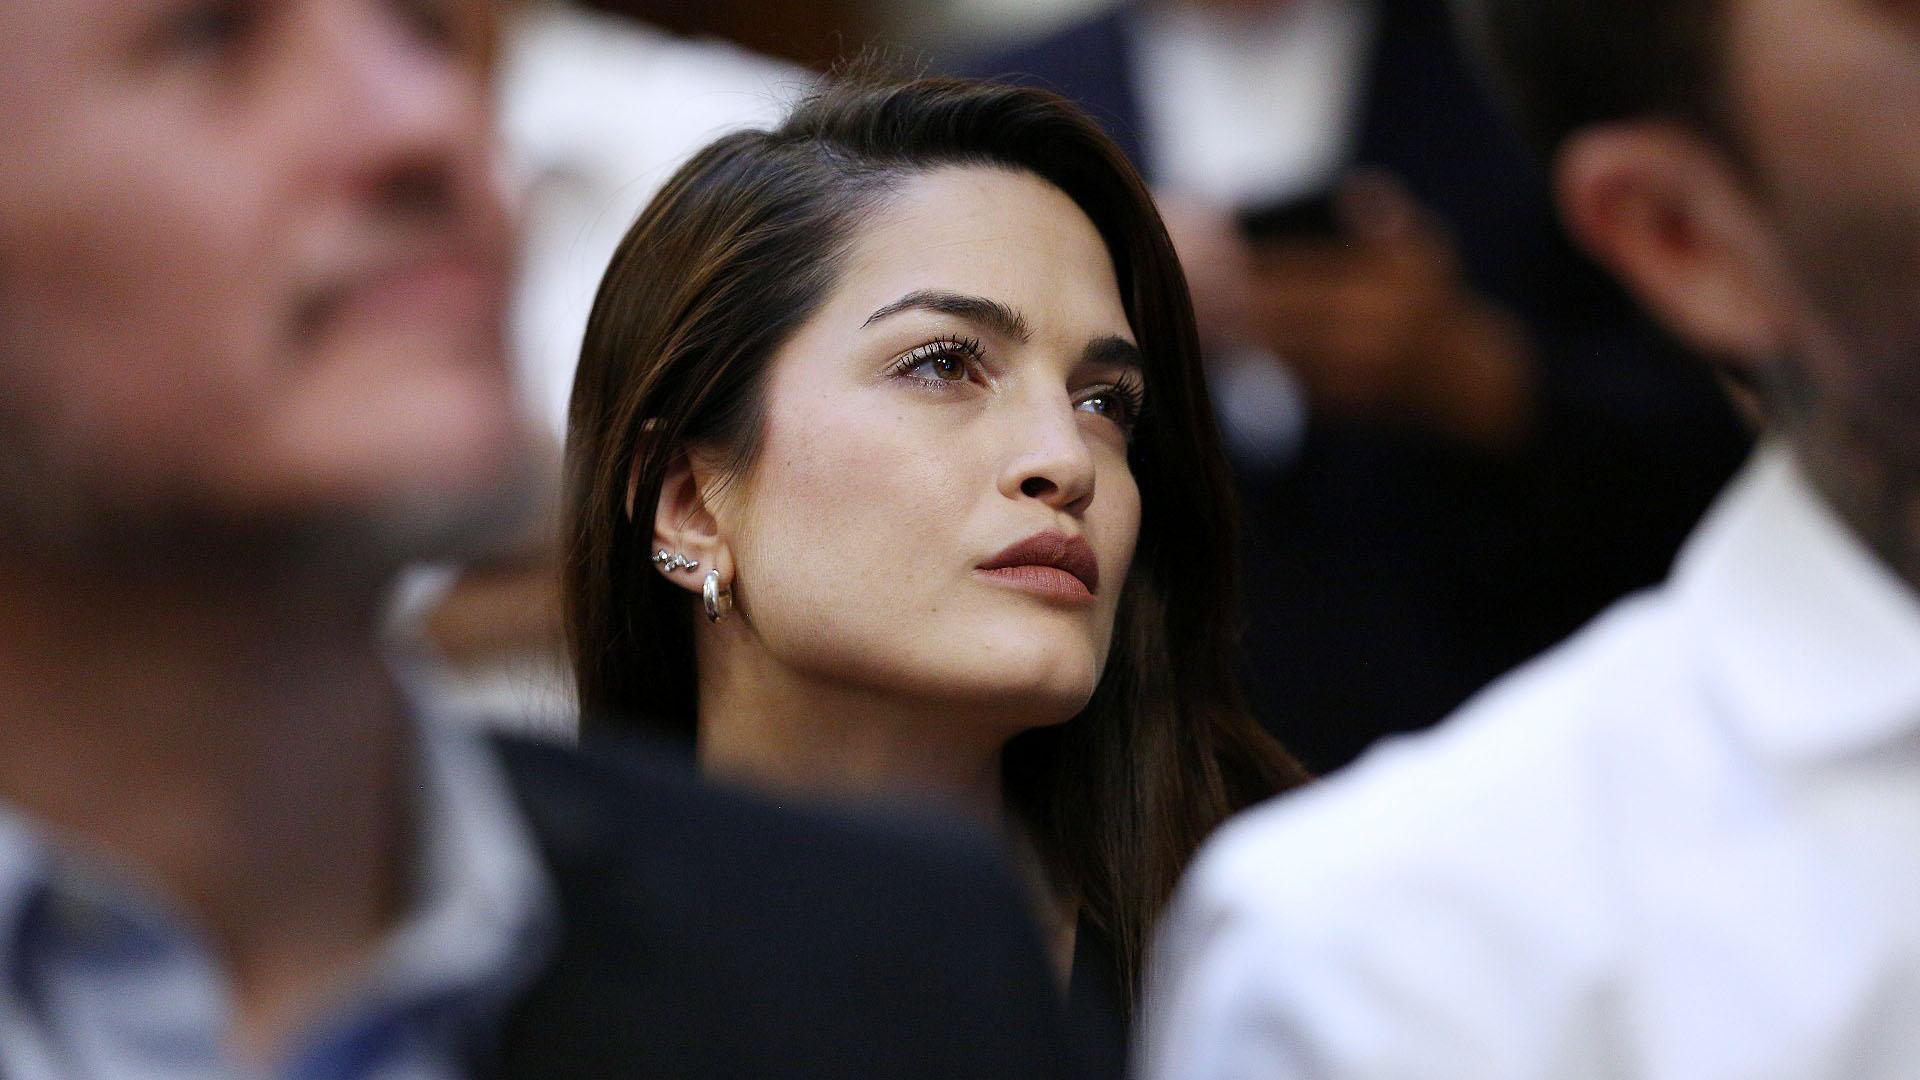 Carla Moure, pareja de Sebastián Ortega